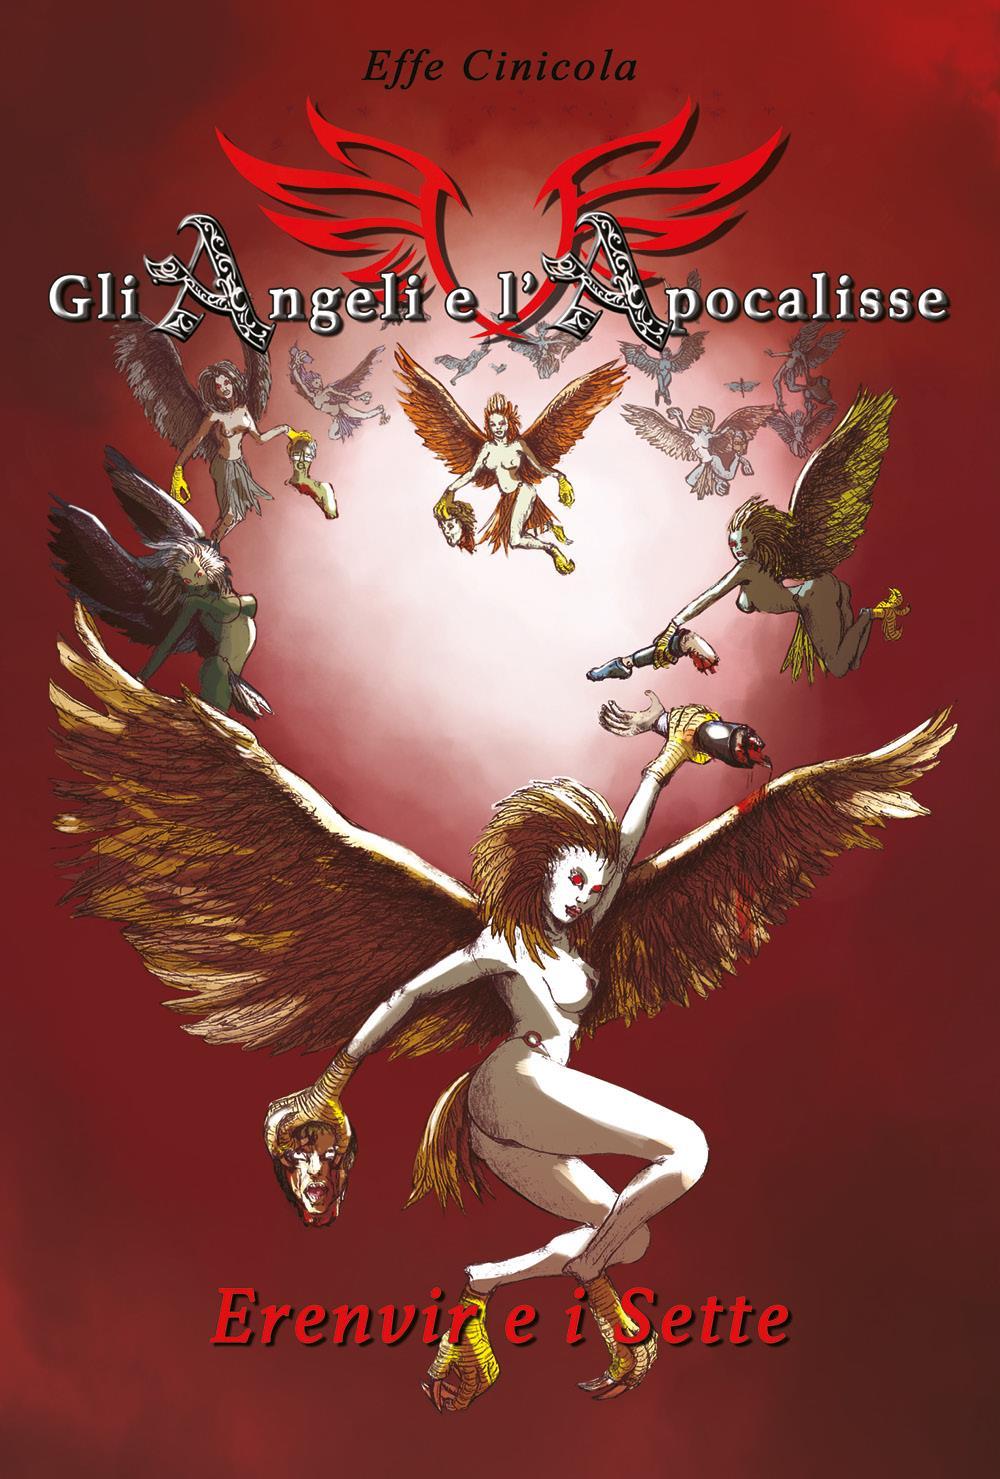 Gli Angeli e l'Apocalisse - Erenvir e i Sette